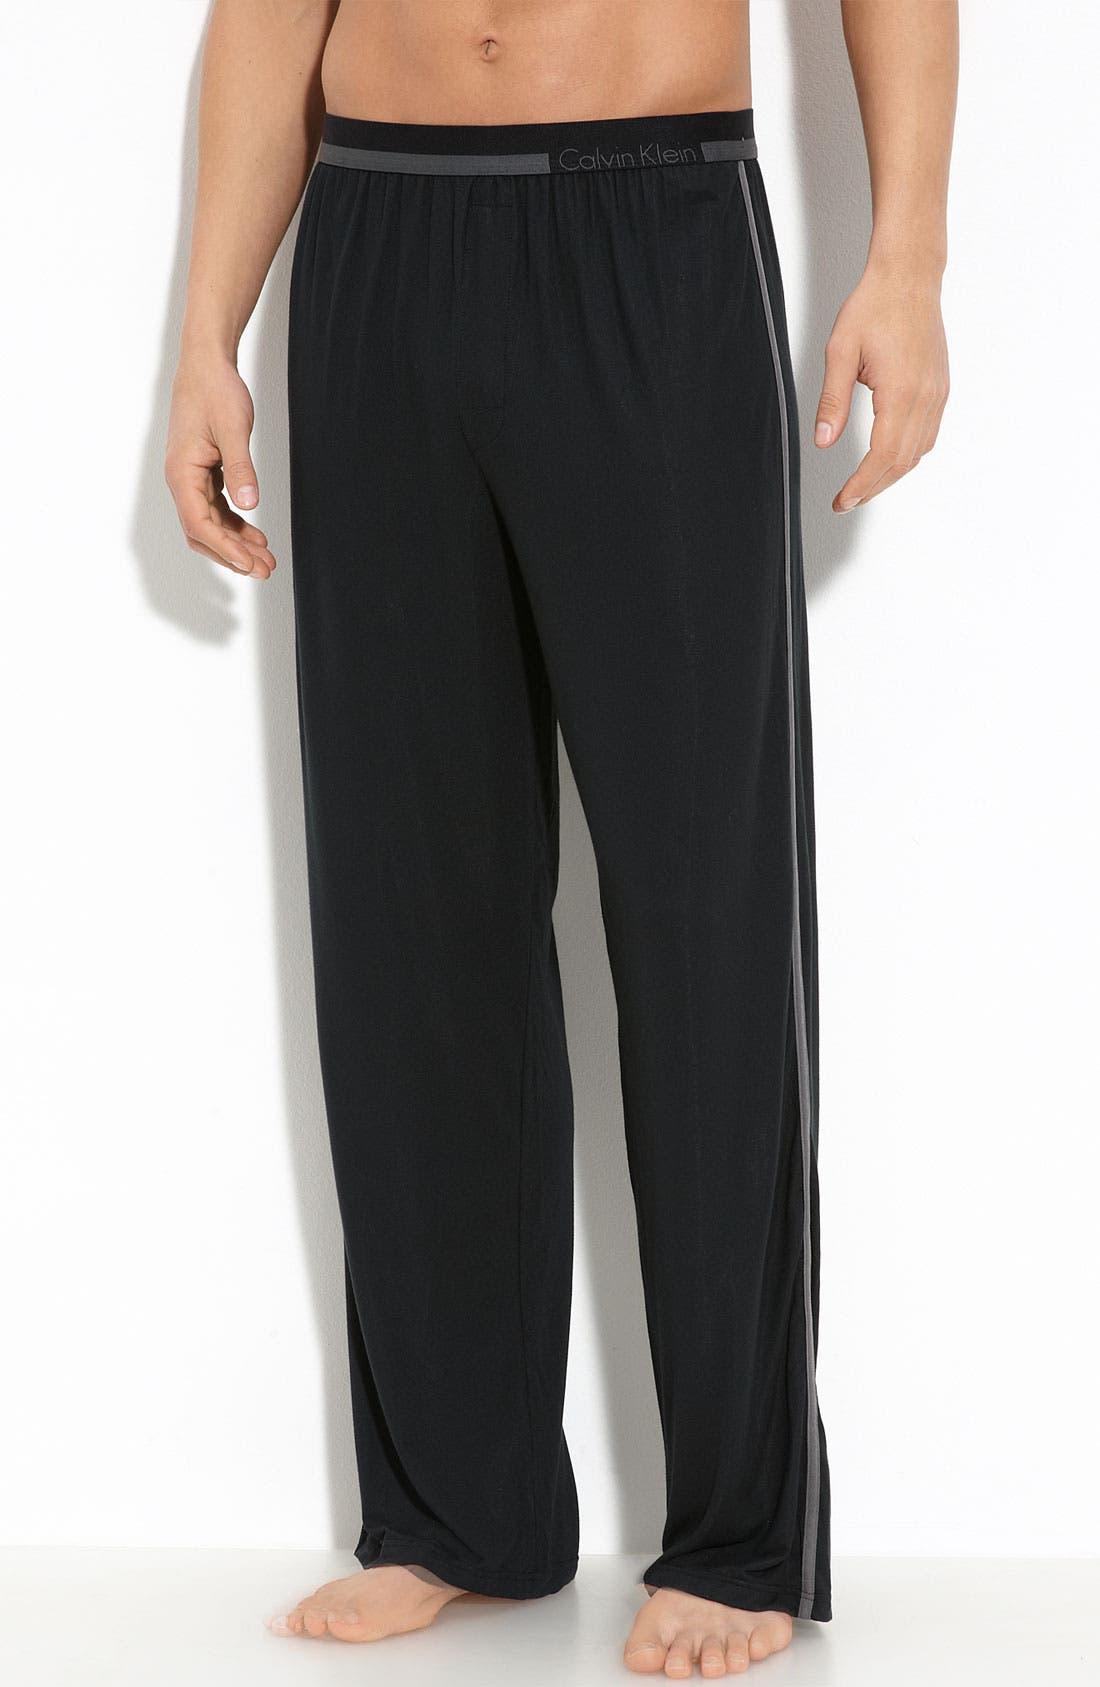 Alternate Image 1 Selected - Calvin Klein 'U5577' Micromodal Lounge Pants